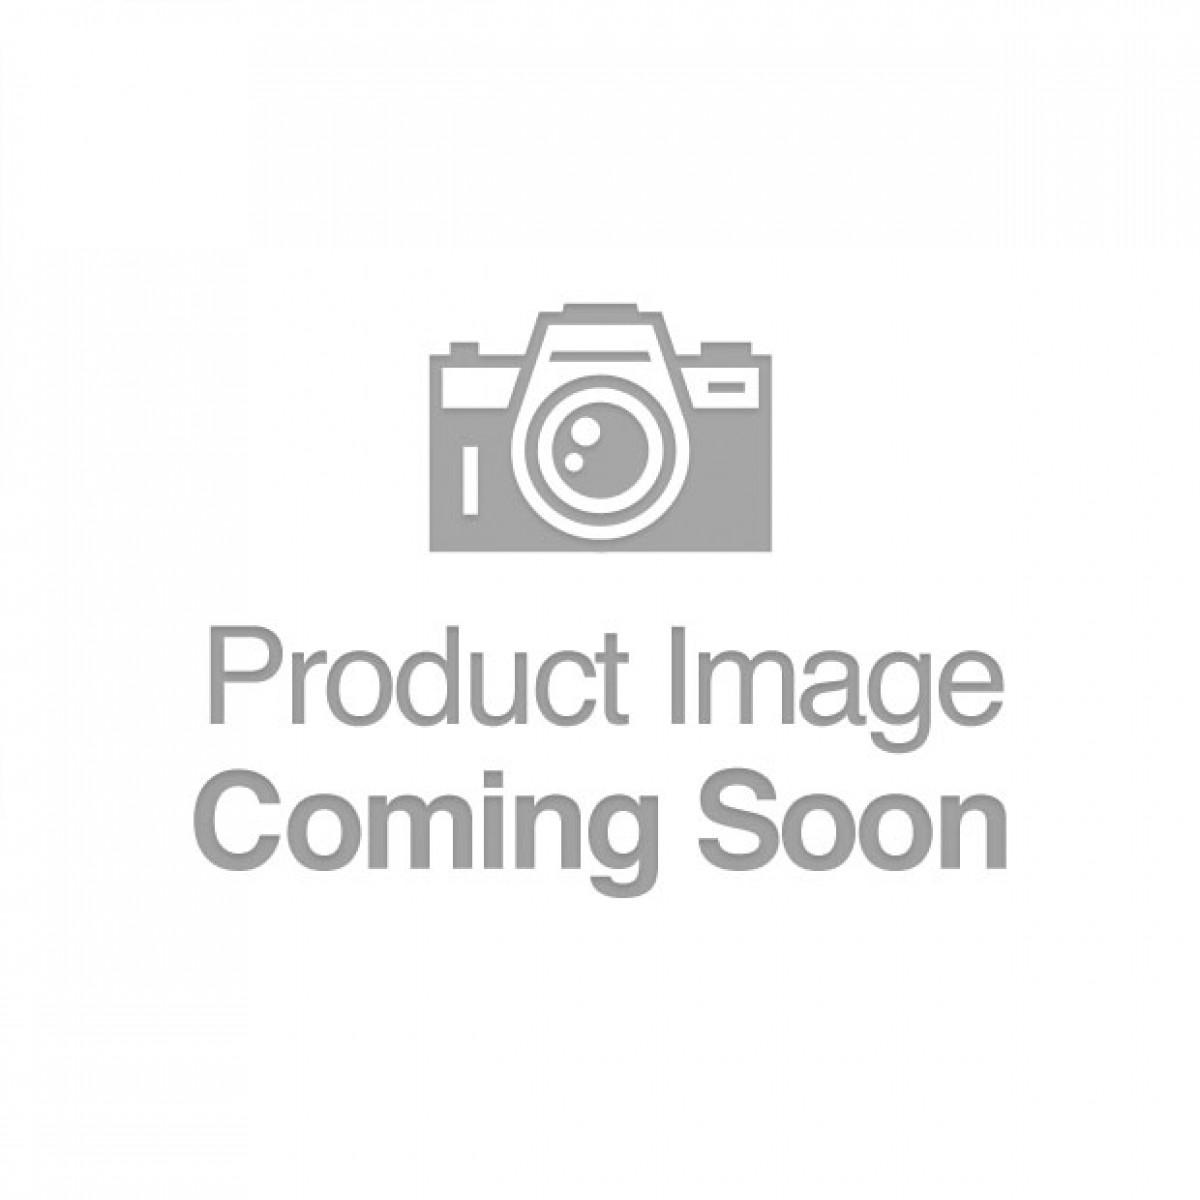 "Dorcel Real Vibration S 6"" Rechargeable Vibrator 2.0 - Gold"